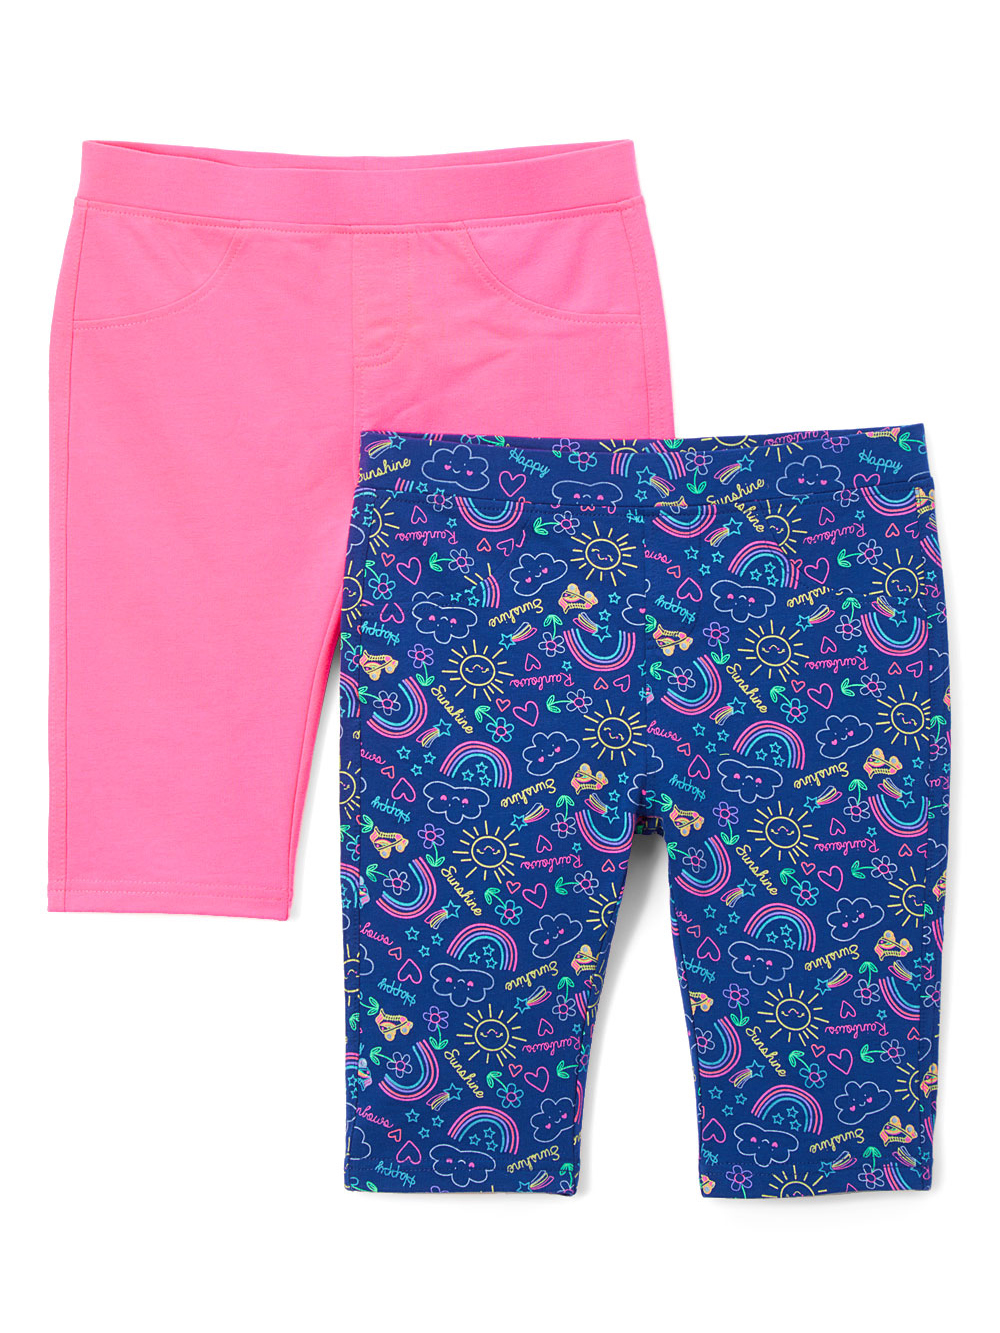 Solid and Printed Bermuda Shorts, 2-pack (Toddler Girls)